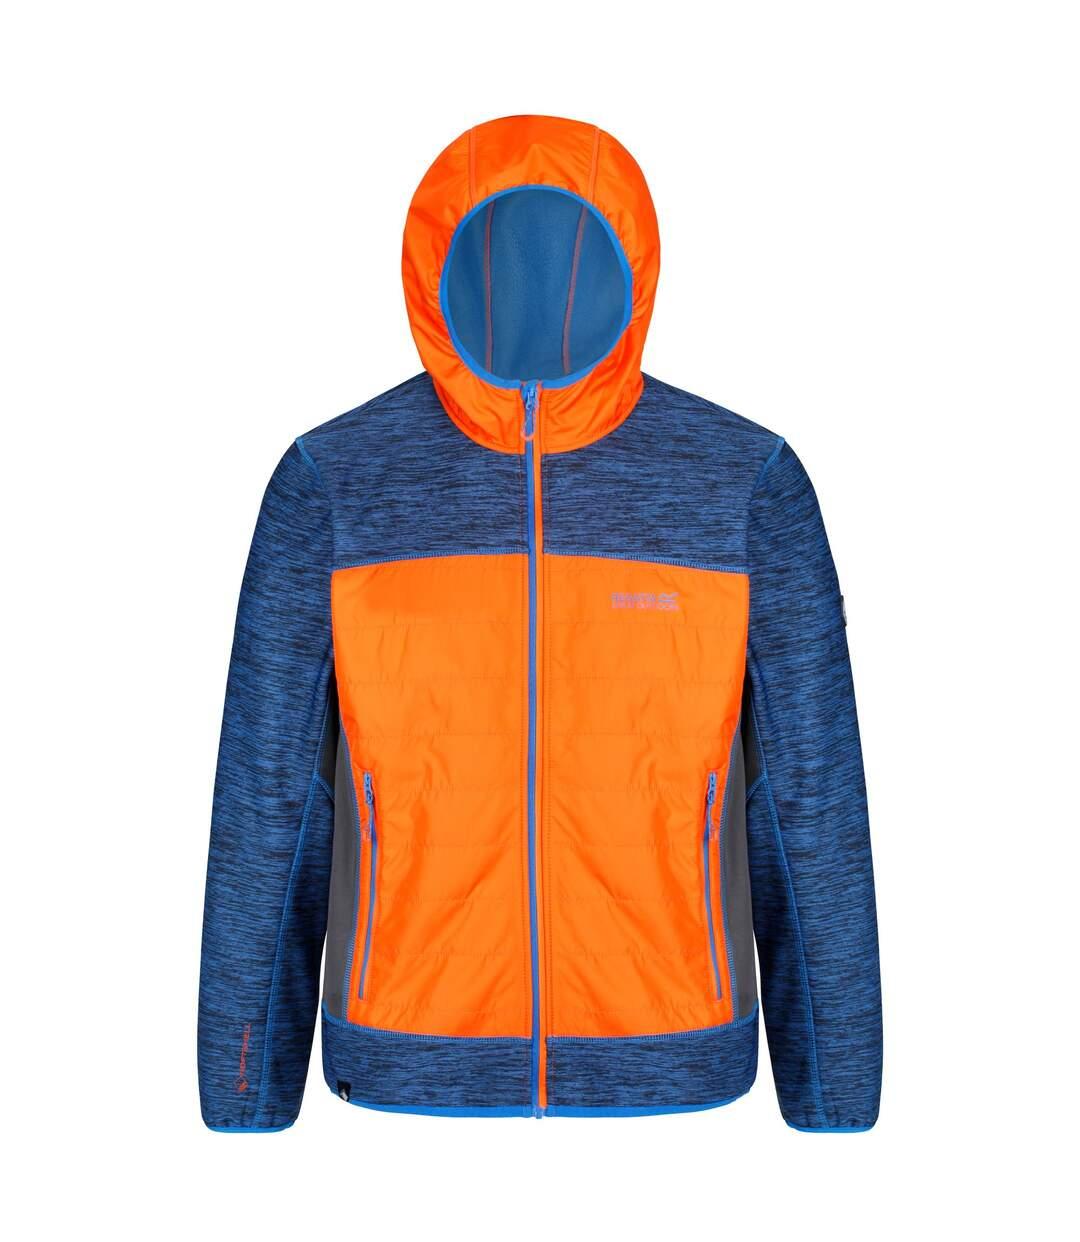 Regatta Mens Harra II Hybrid Stretch Water Repellent Softshell Jacket (Oxford Blue/Orange Blaze) - UTRG3850